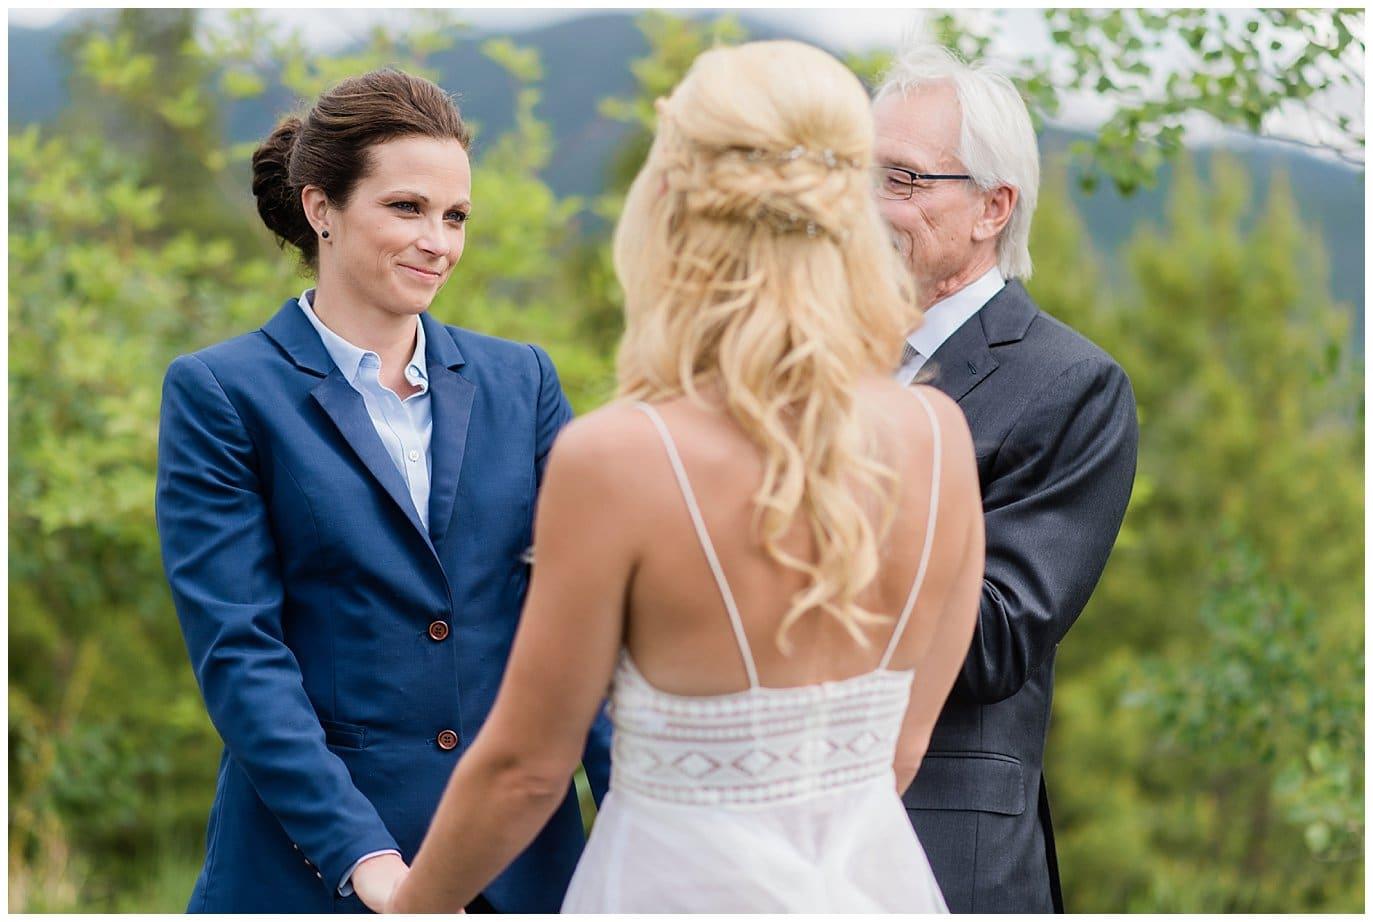 same-sex wedding photo